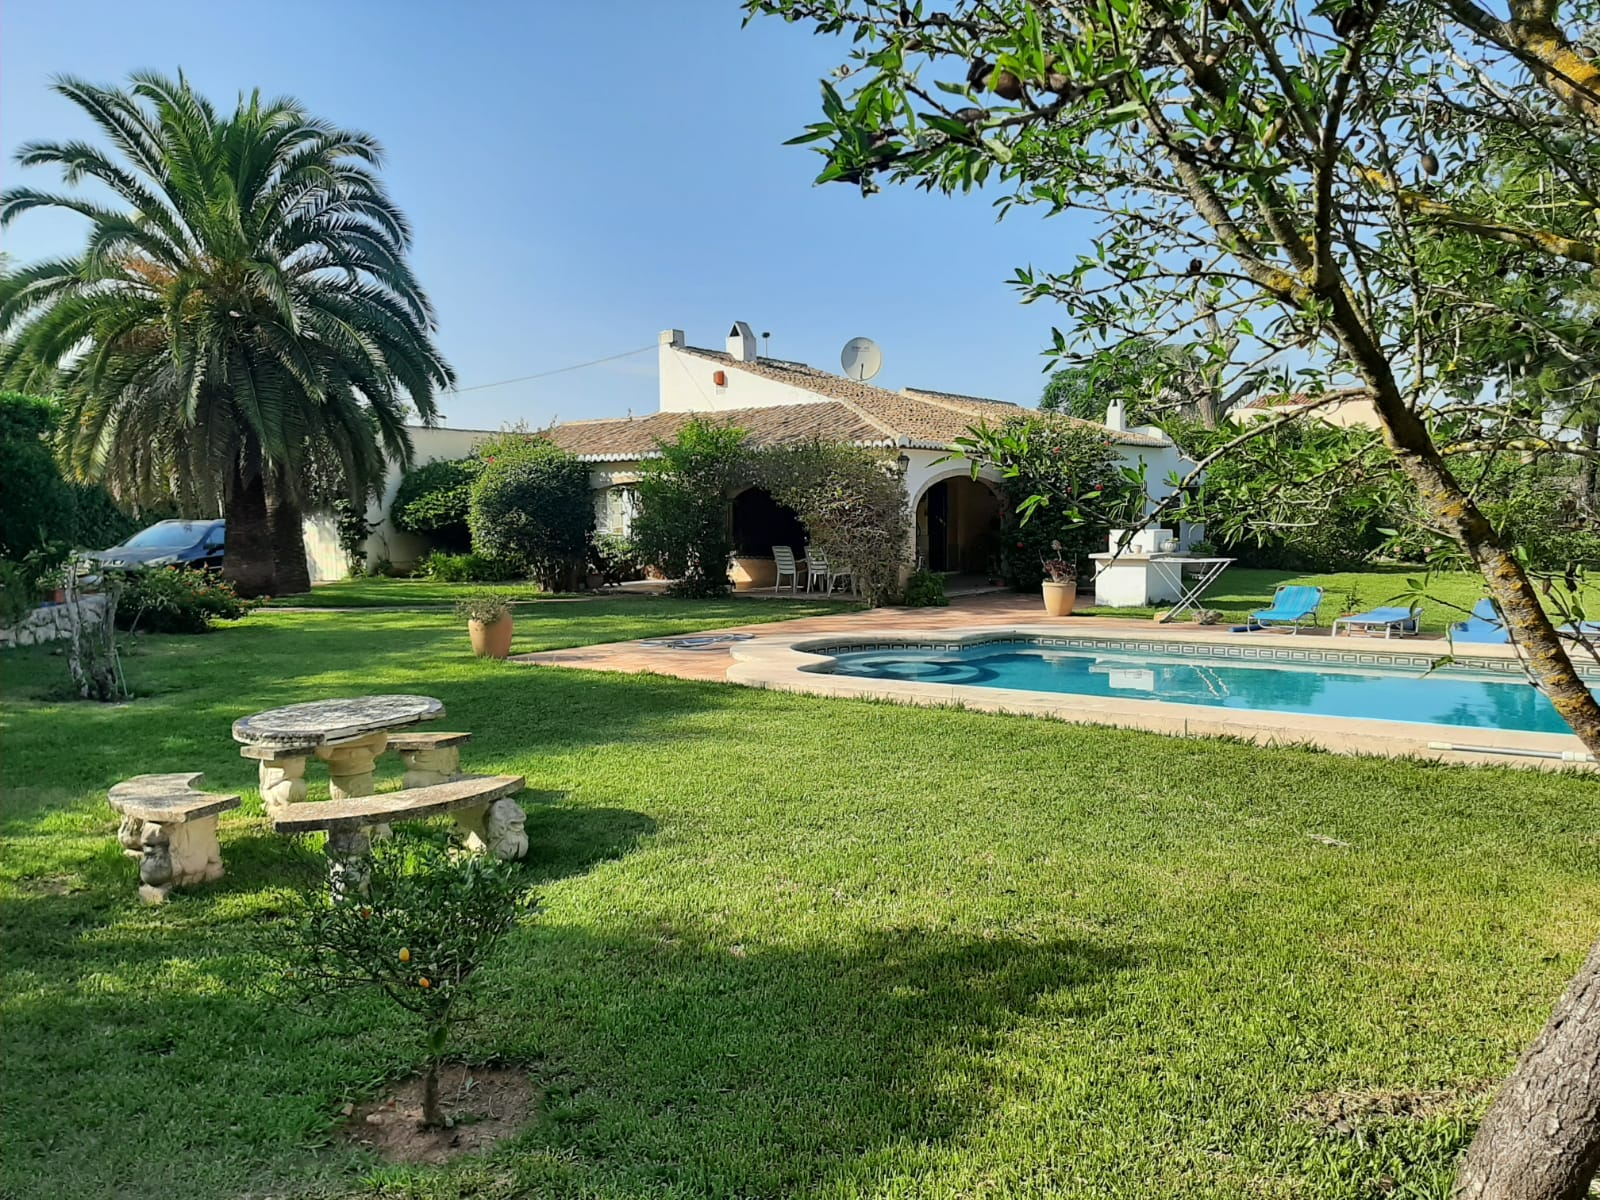 4 Bedroom Finca / Country House in Javea